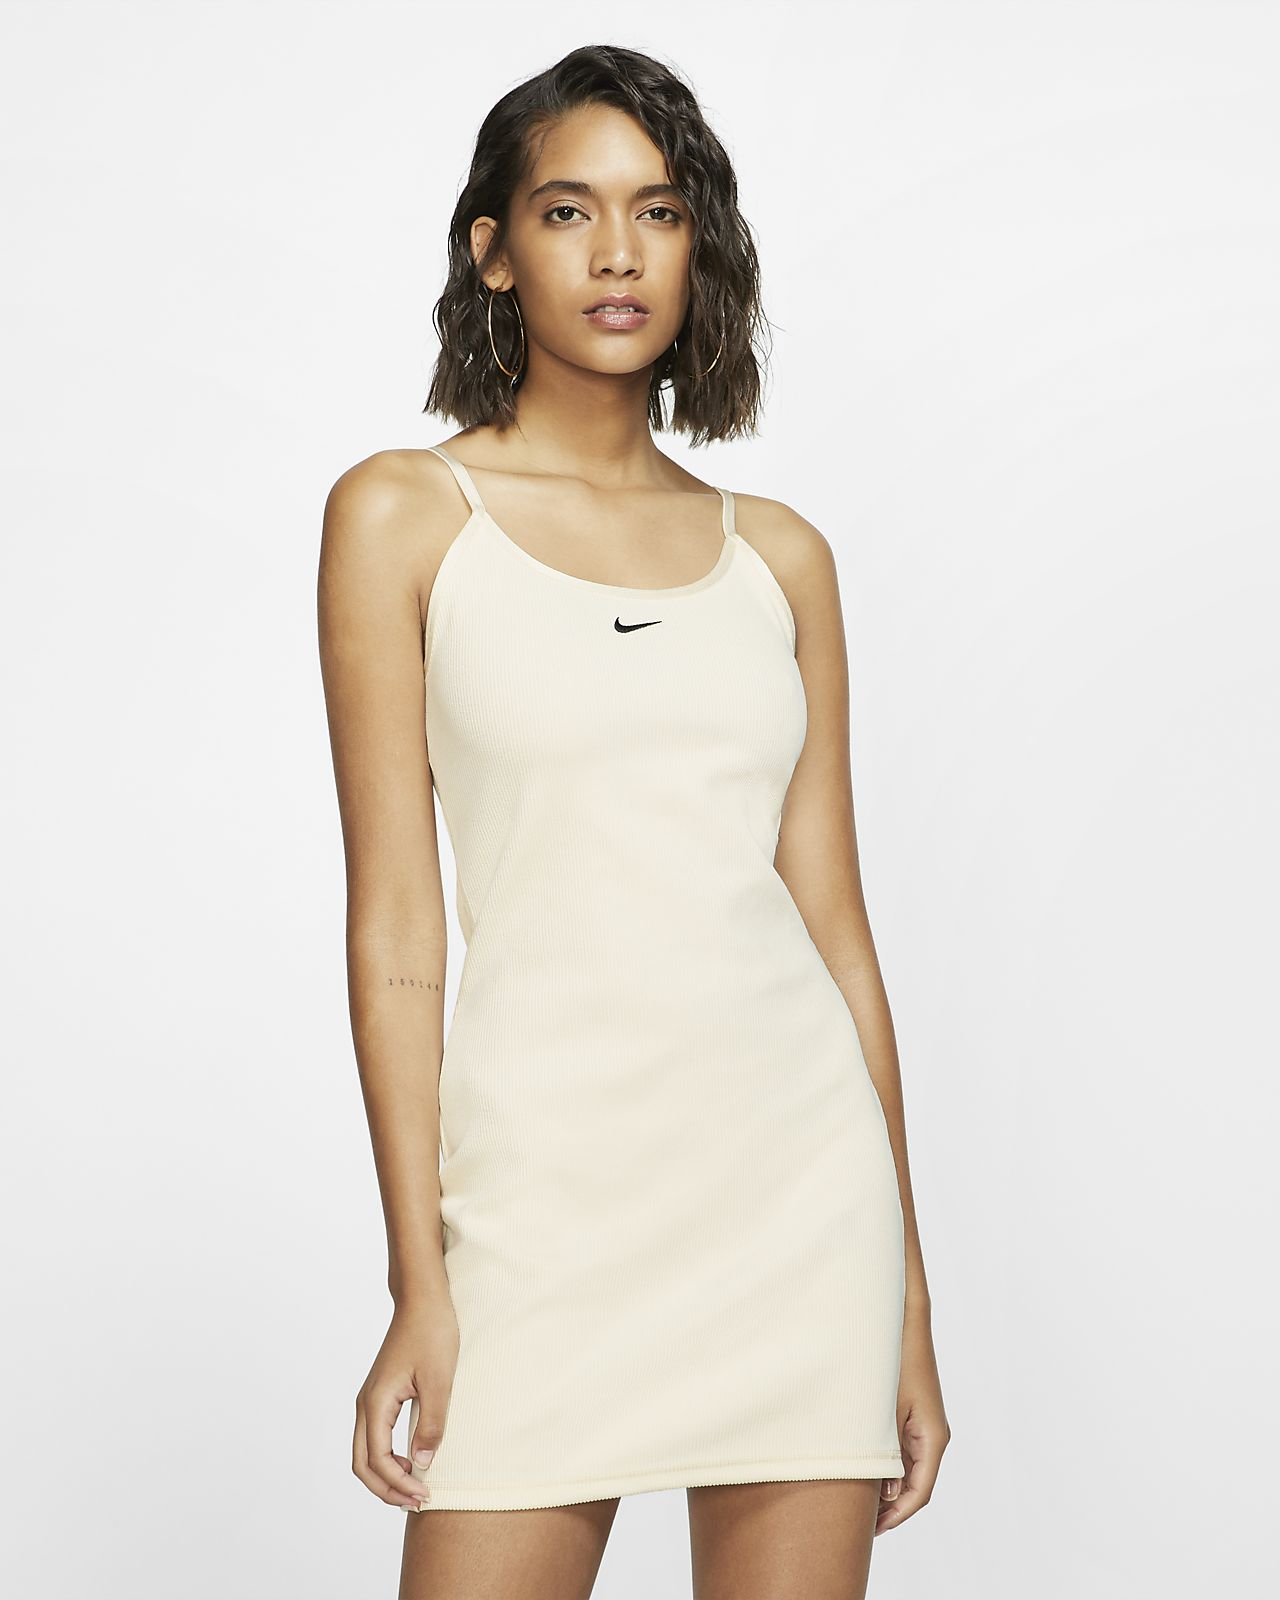 Robe JDI côtelée Nike Sportswear pour Femme